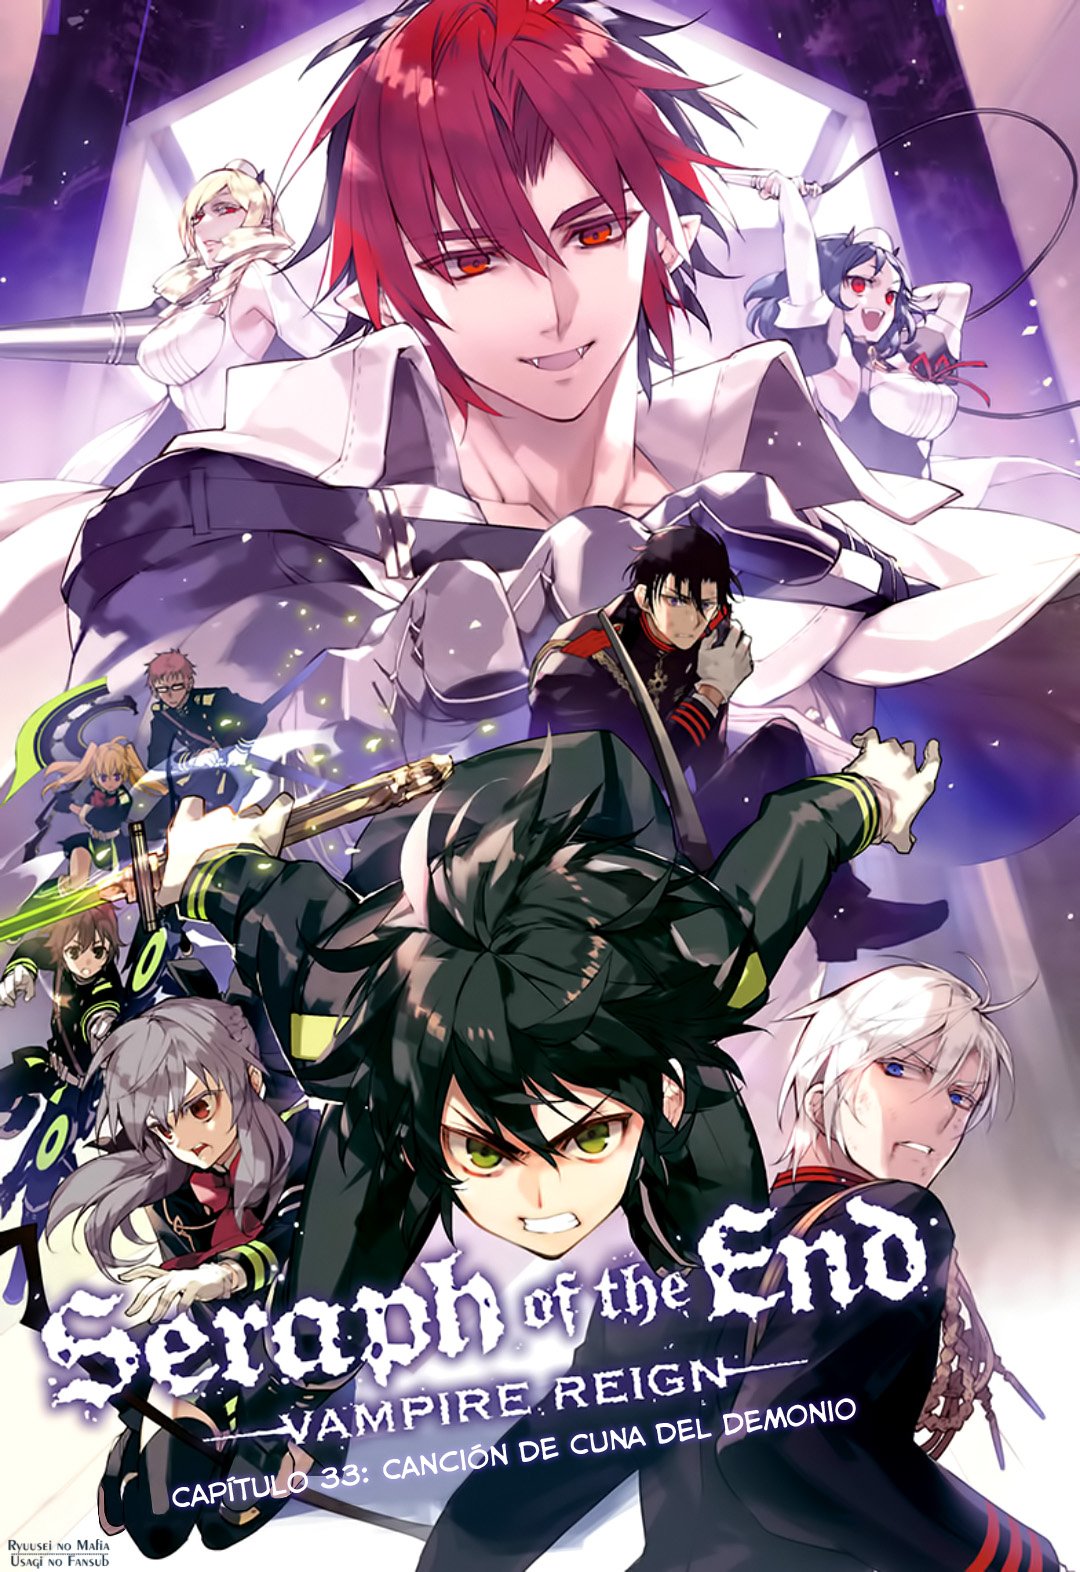 http://c5.ninemanga.com/es_manga/49/3057/381078/d19869fc88b2fefe711e0cc30ed2be8a.jpg Page 4